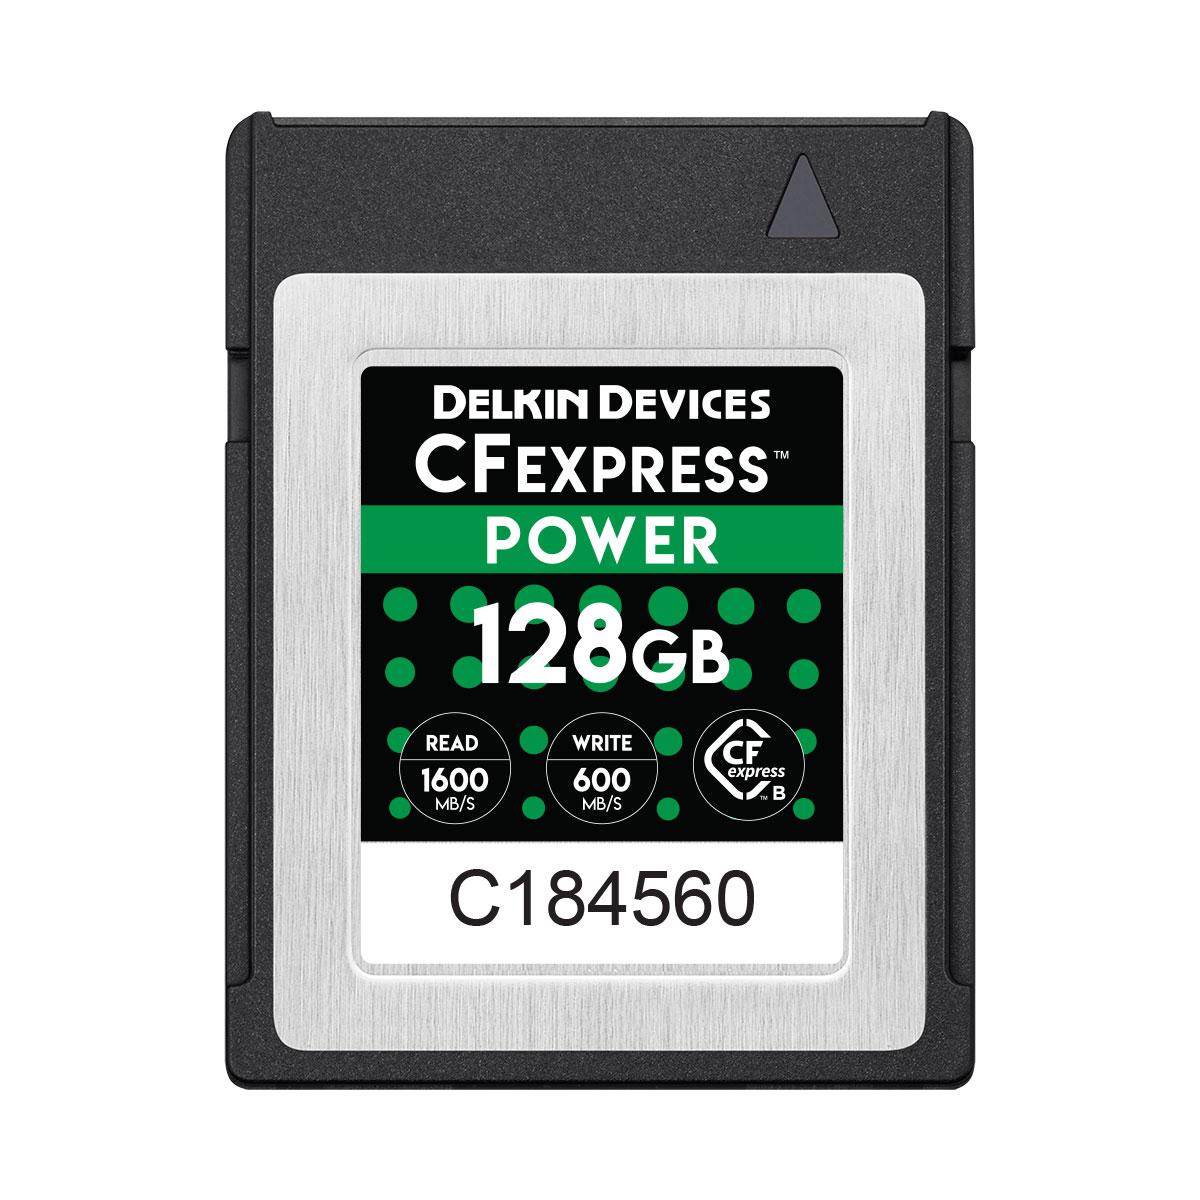 128GB CFexpress POWER メモリーカード